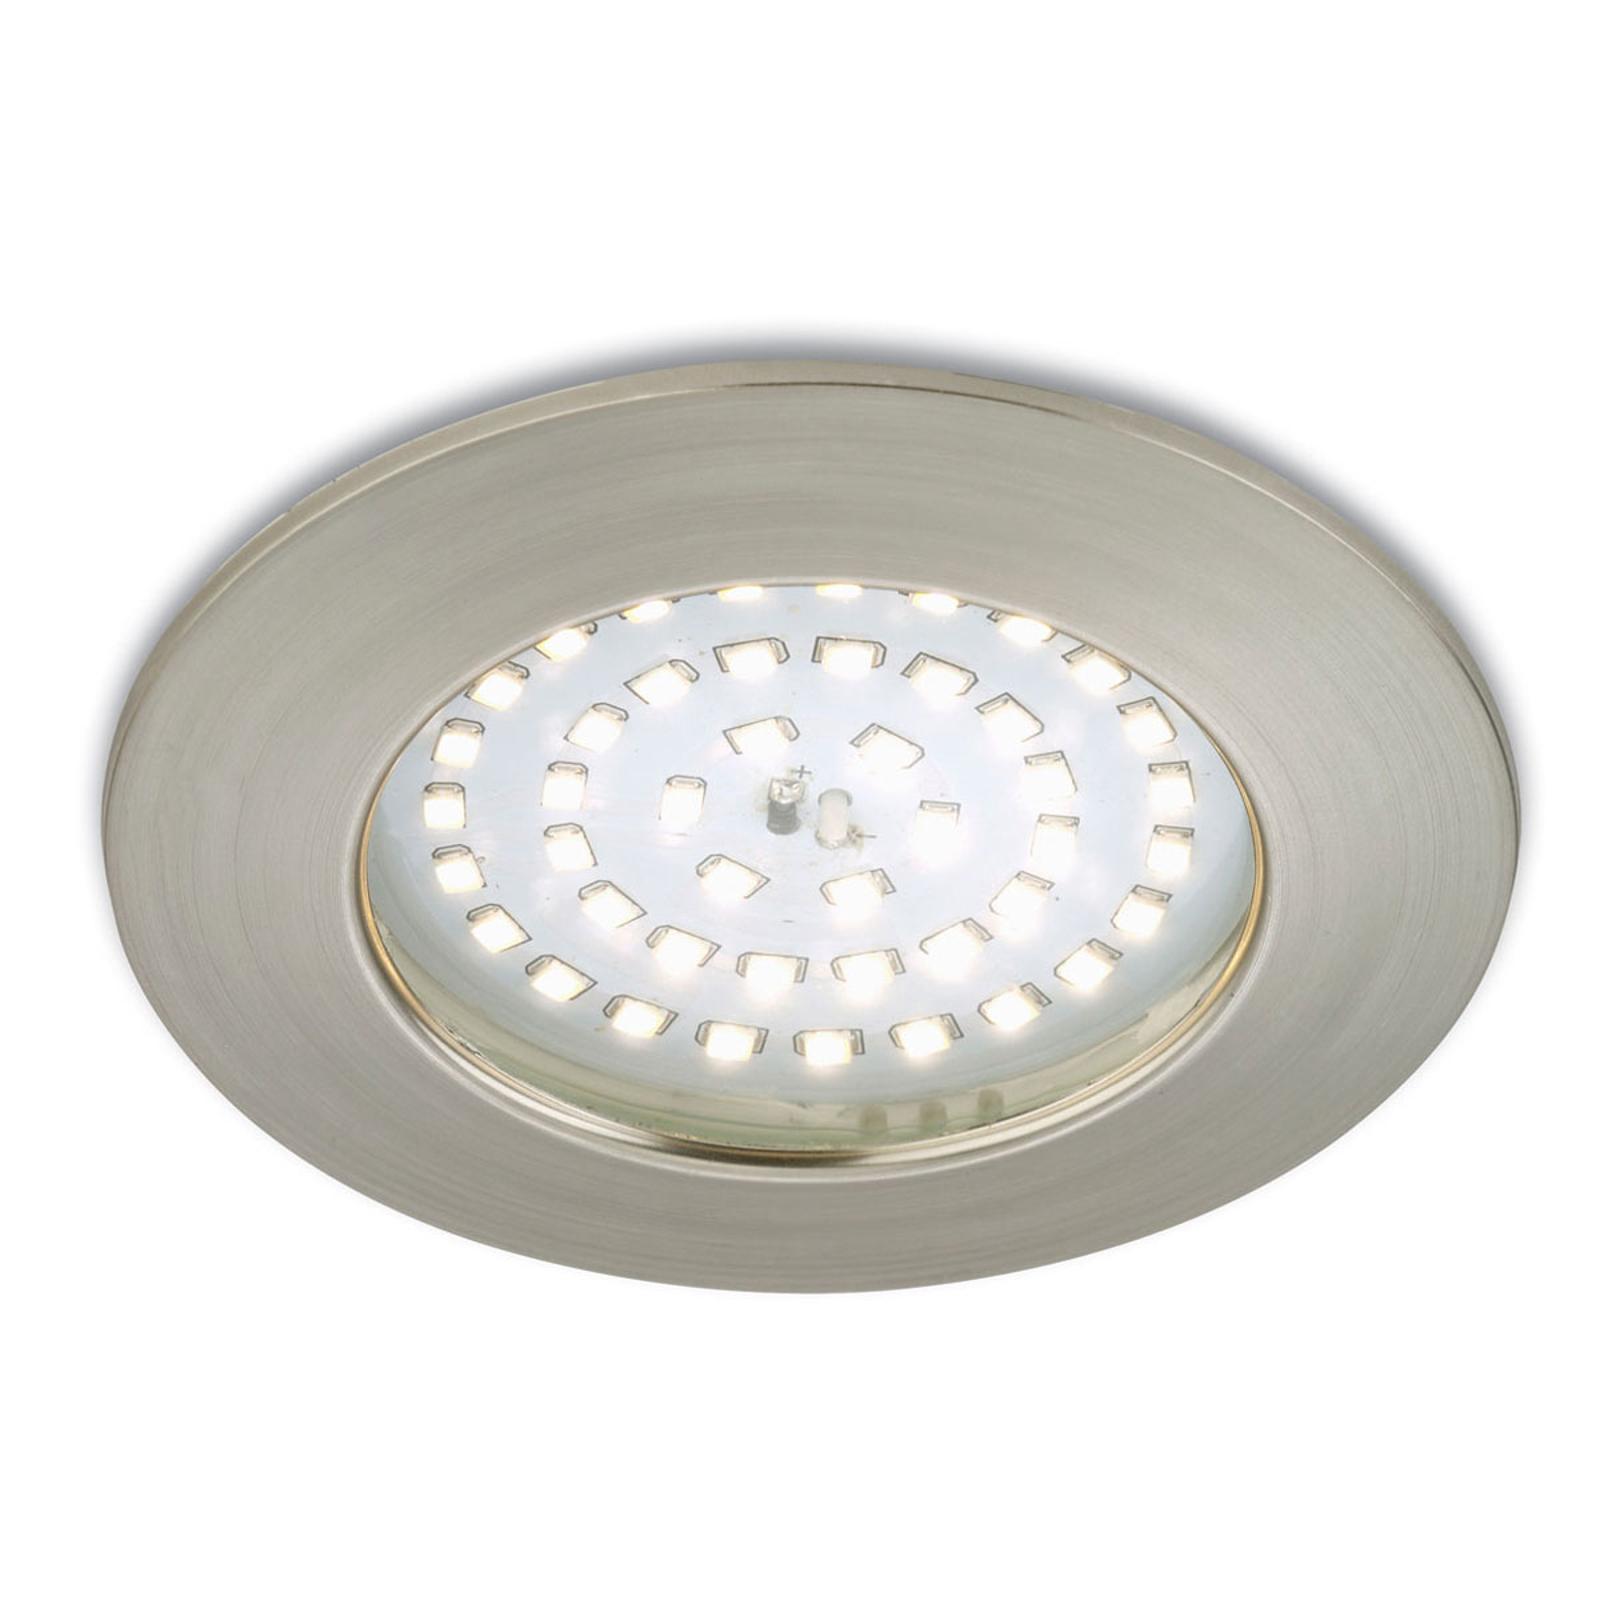 Accentuerende LED inbouwspot Paul mat nikkel